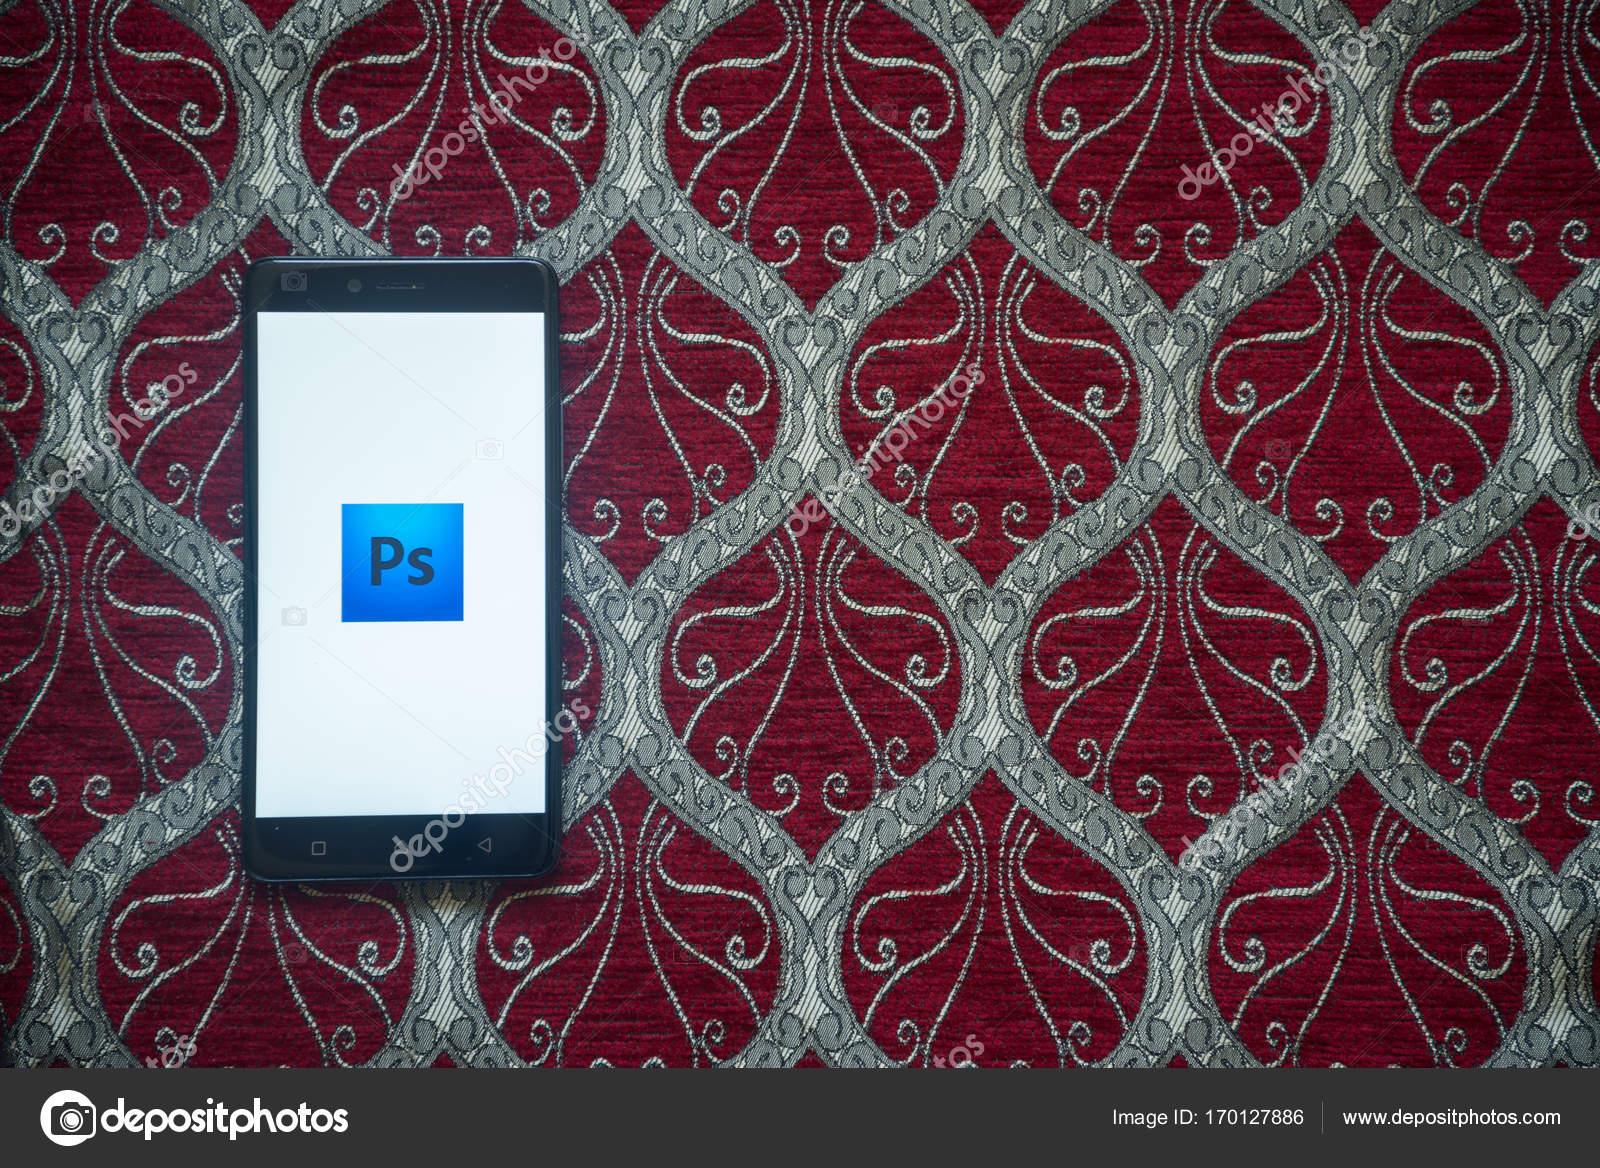 Adobe photoshop logo on smartphone screen – Stock Editorial